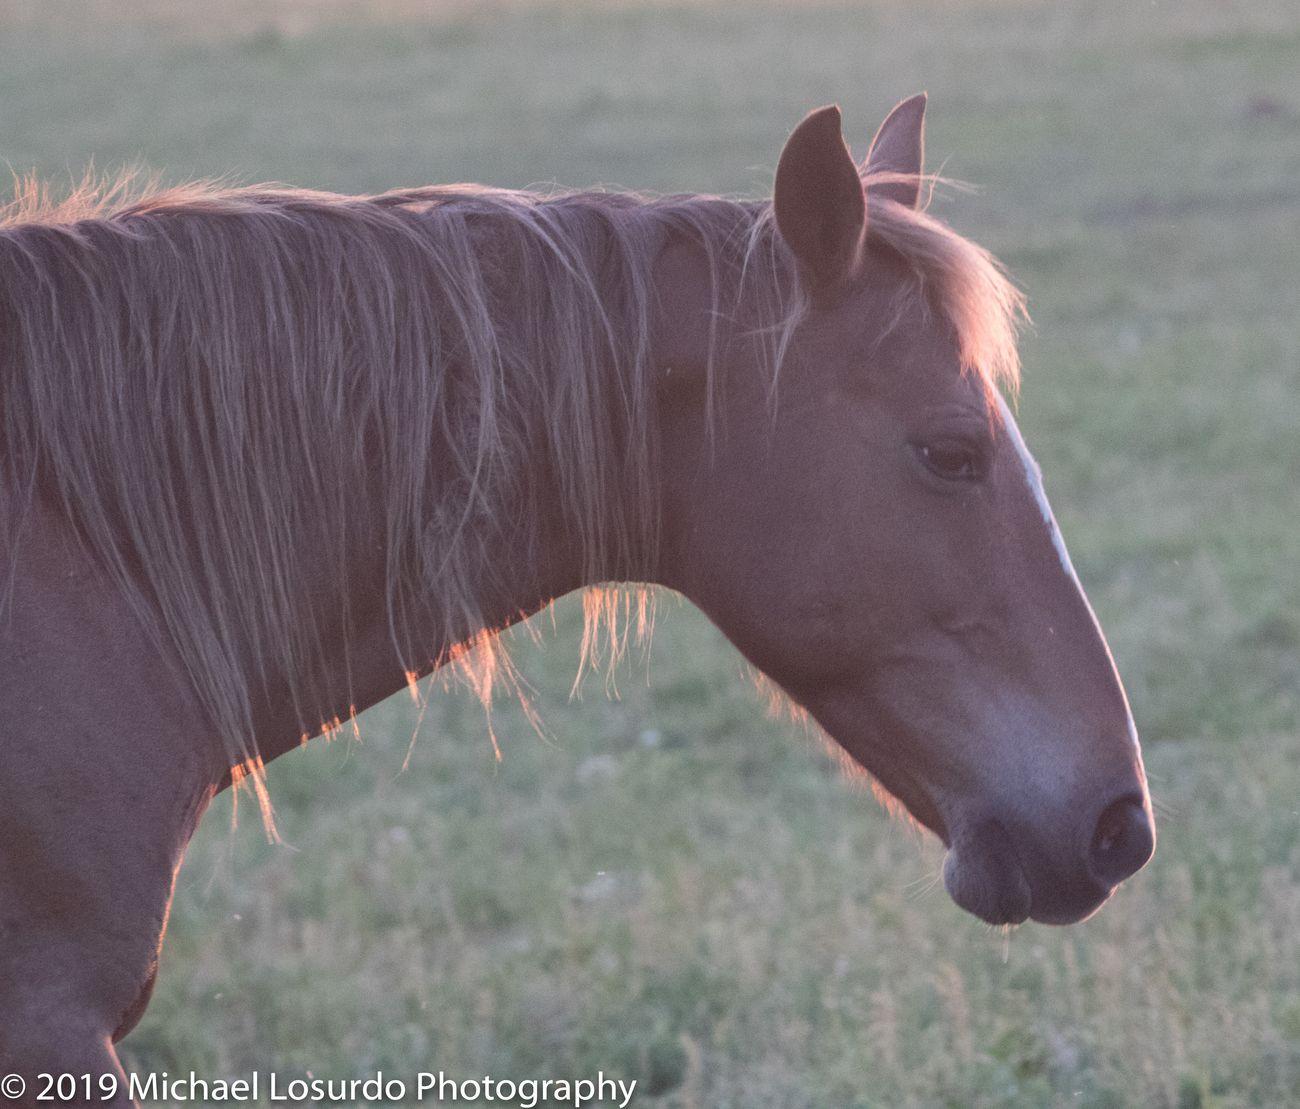 Mowdy Mustang Ranch Coalgate, OK